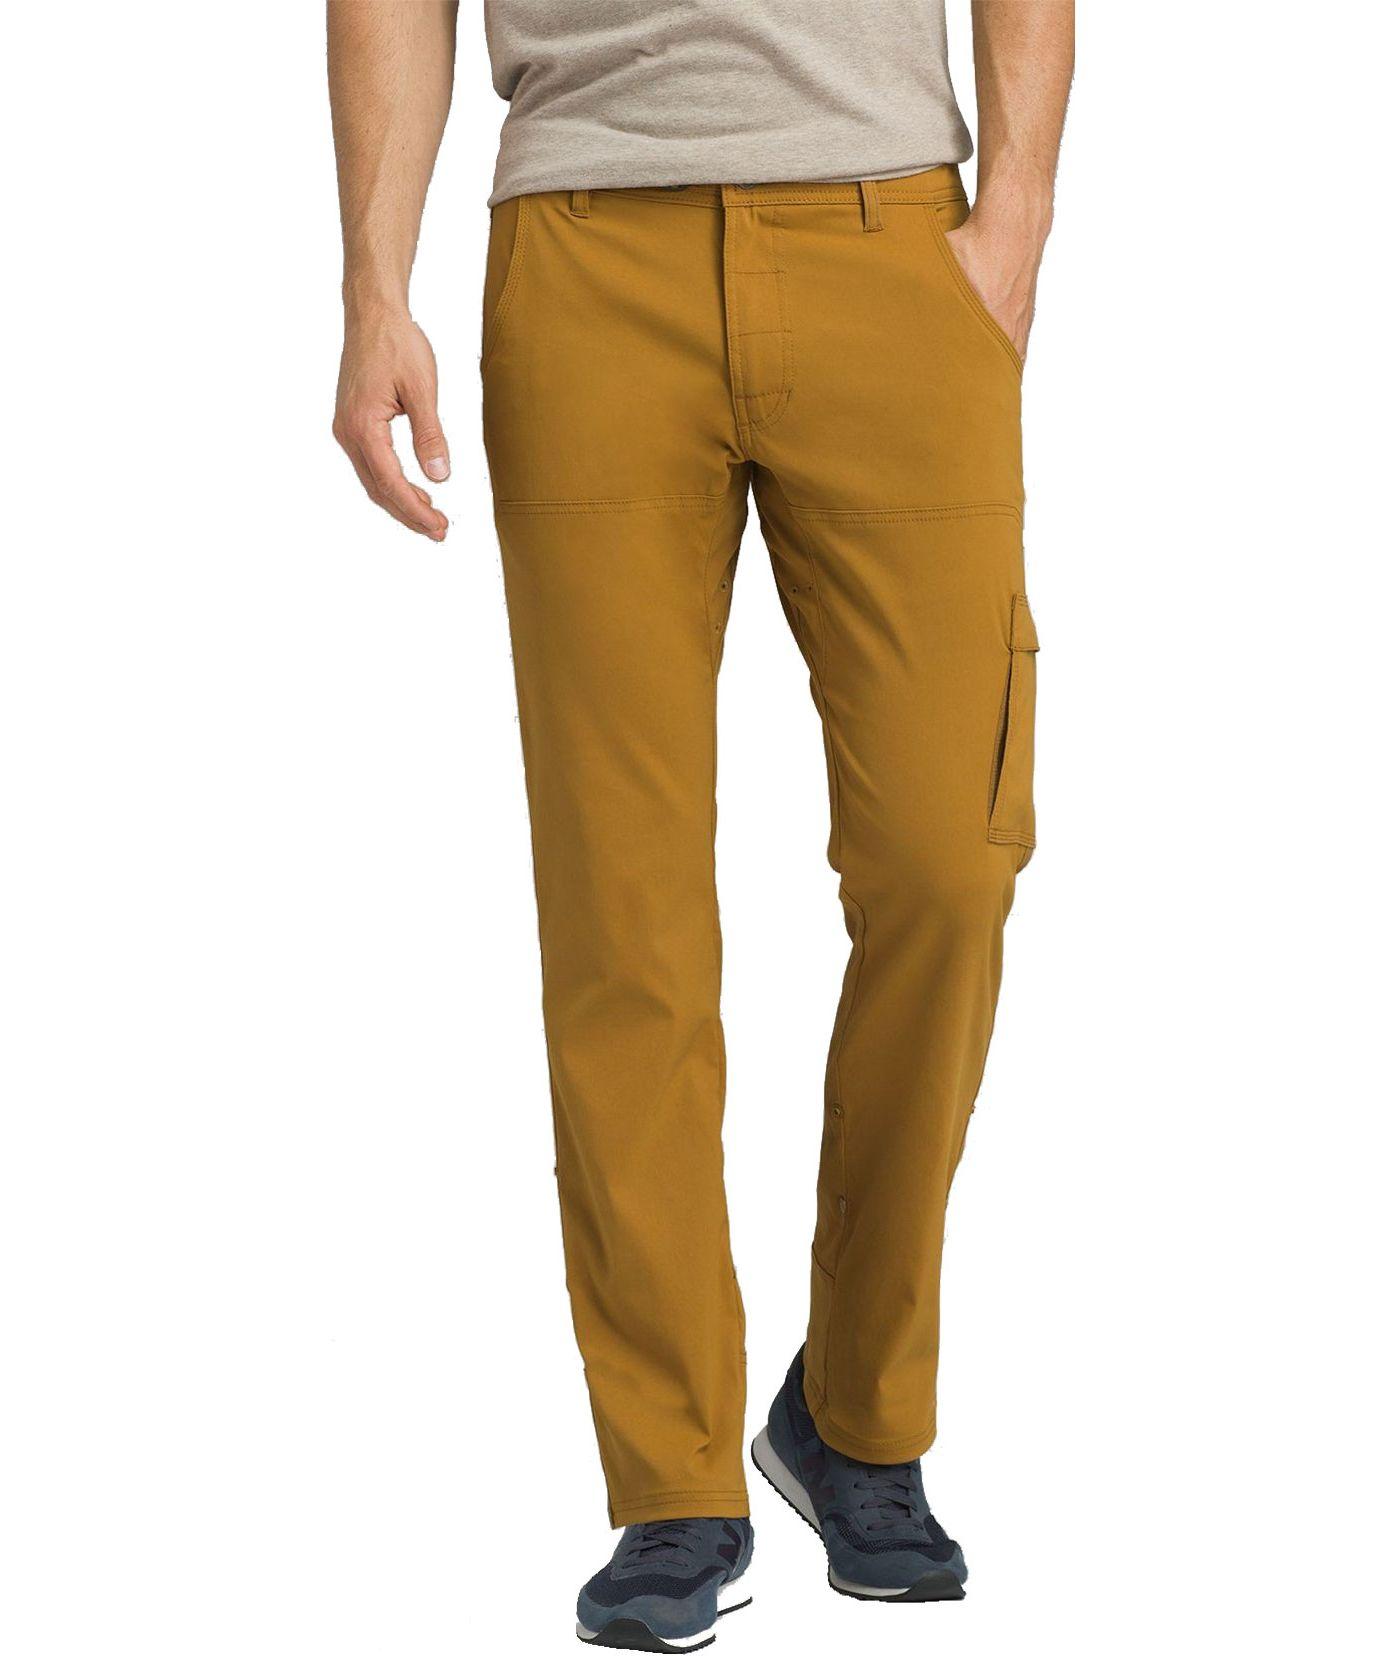 prAna Men's Stretch Zion Straight Pants (Regular and Big & Tall)